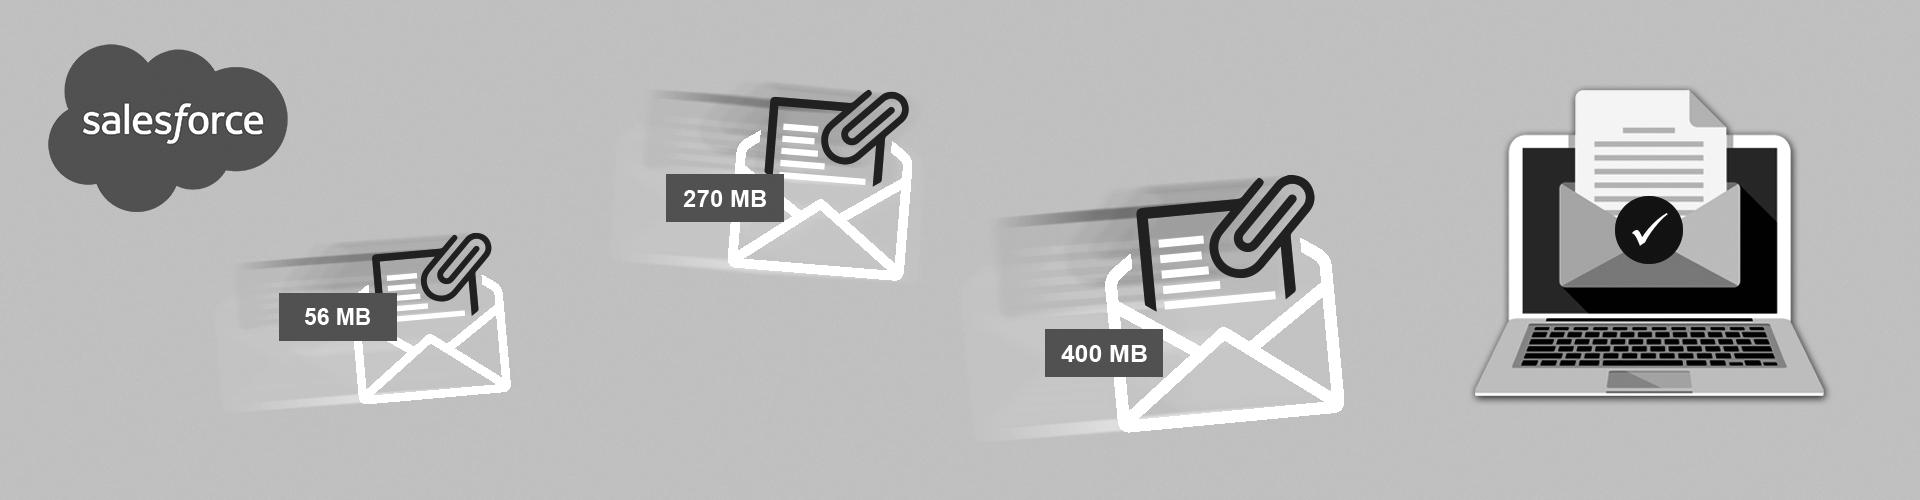 Mass Email Attachment in Salesforce - MassMailer